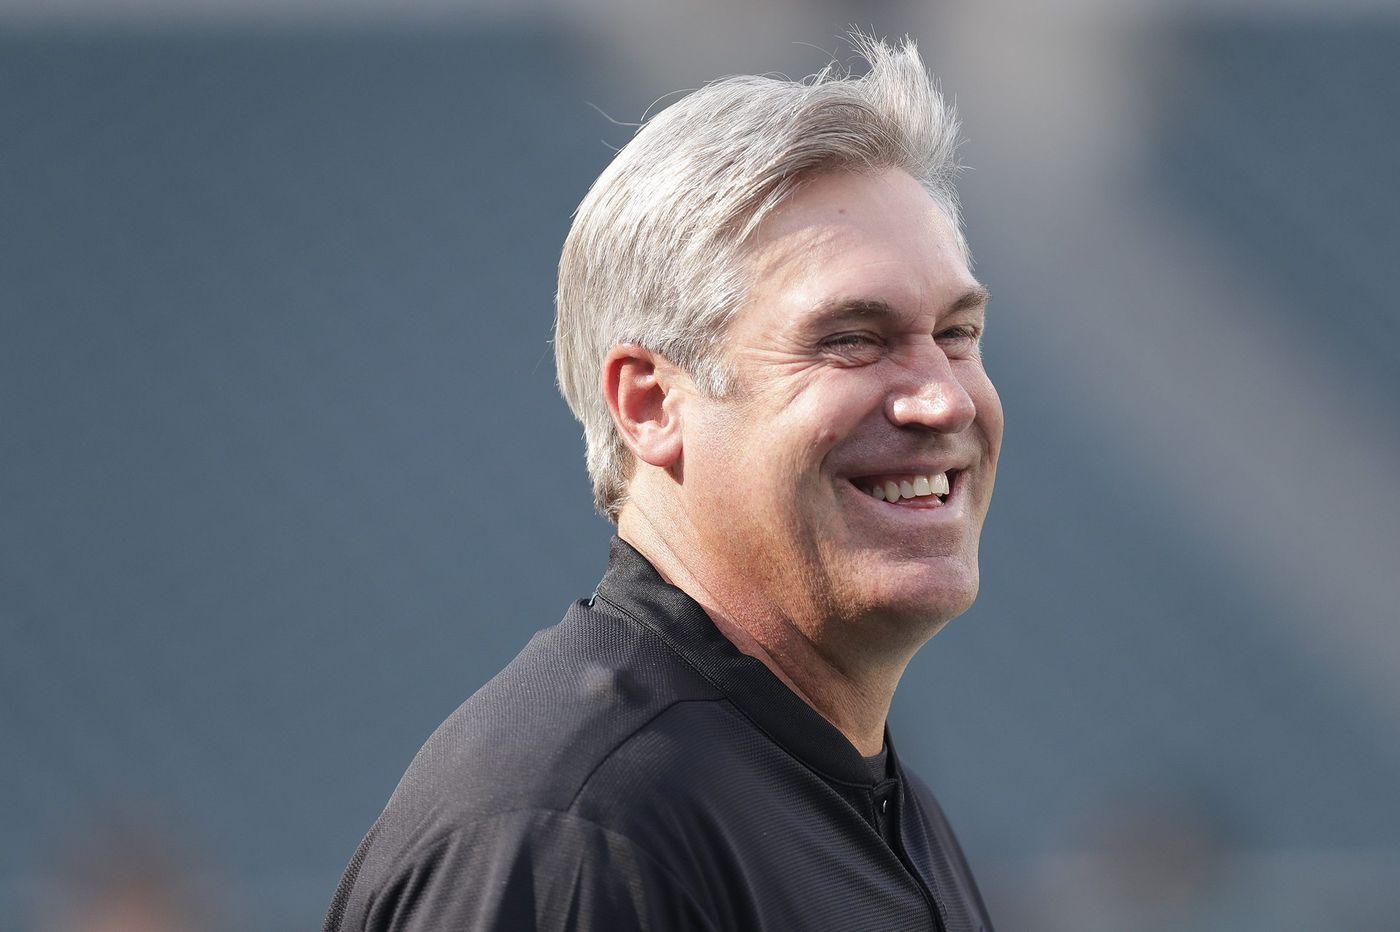 Eagles coach Doug Pederson's new memoir, FEARLESS, reveals a successful coach in spite of self-doubt